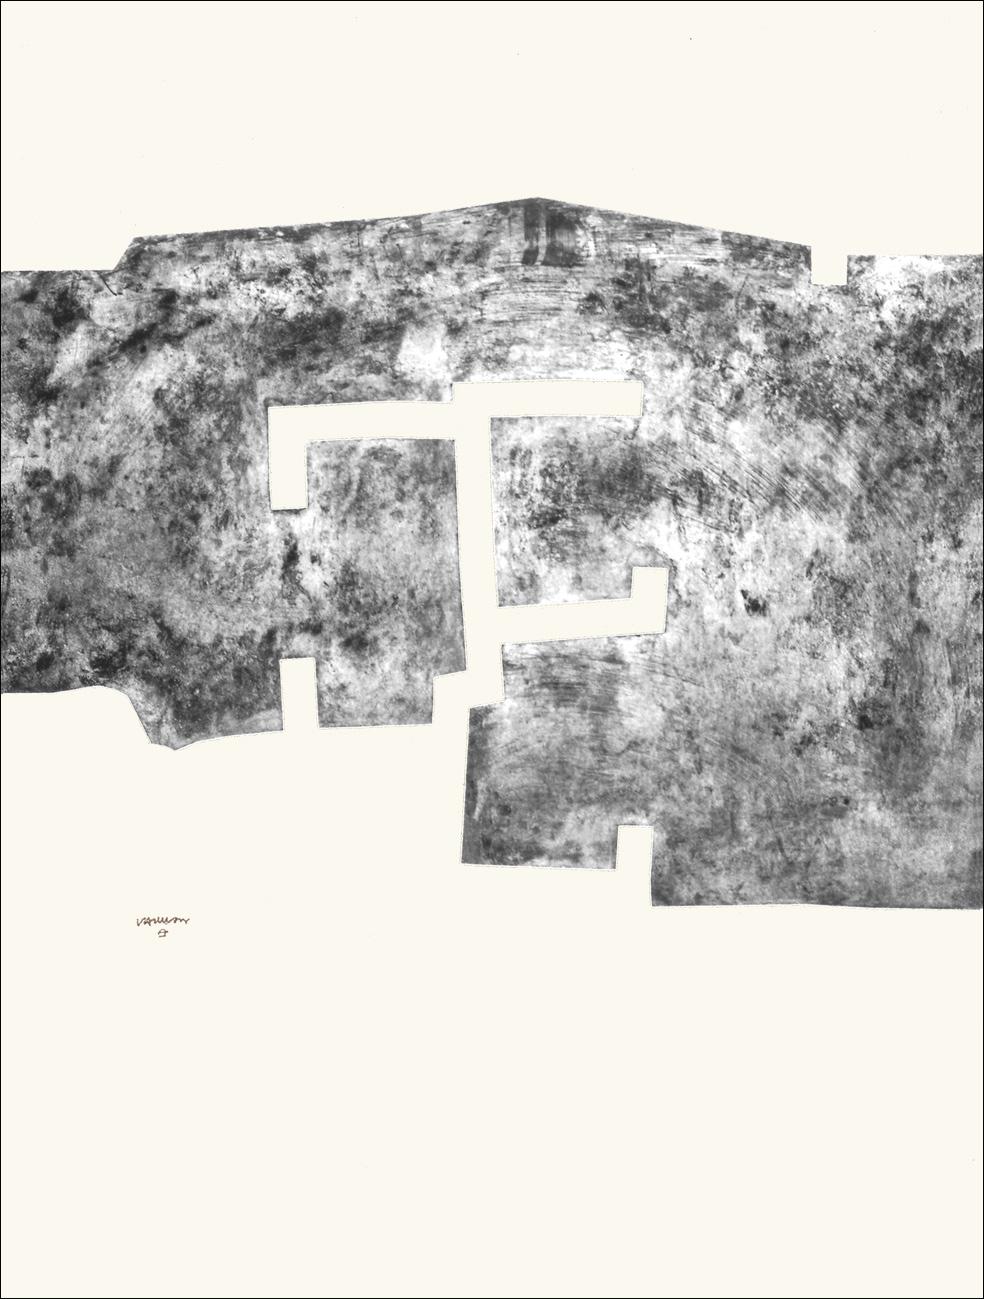 Eduardo Chillida - Euzkadi V, Original Etching, 1974. 63 x 47.6 in., Signed and Numbered 47 x 50